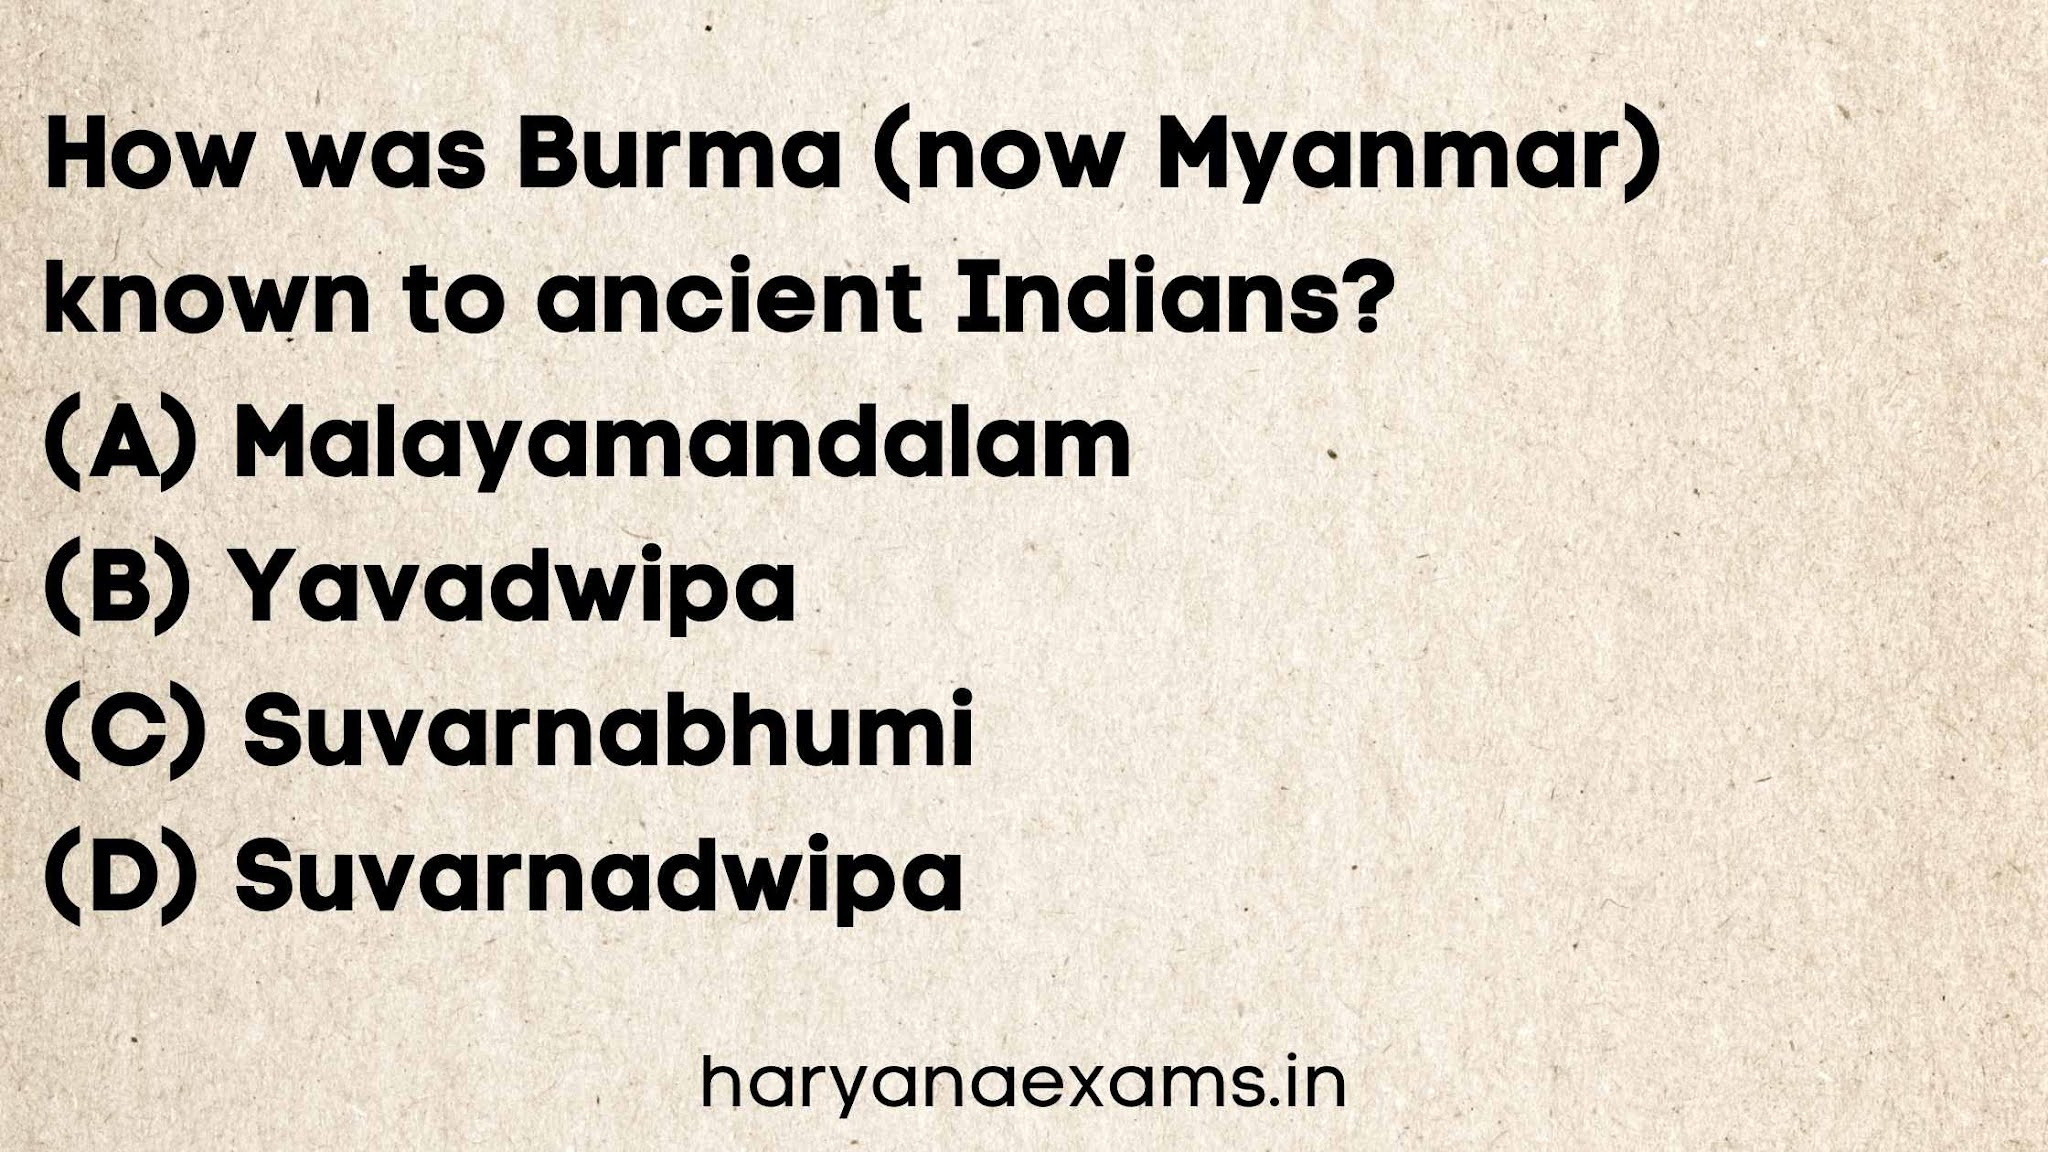 How was Burma (now Myanmar) known to ancient Indians?   (A) Malayamandalam   (B) Yavadwipa   (C) Suvarnabhumi   (D) Suvarnadwipa